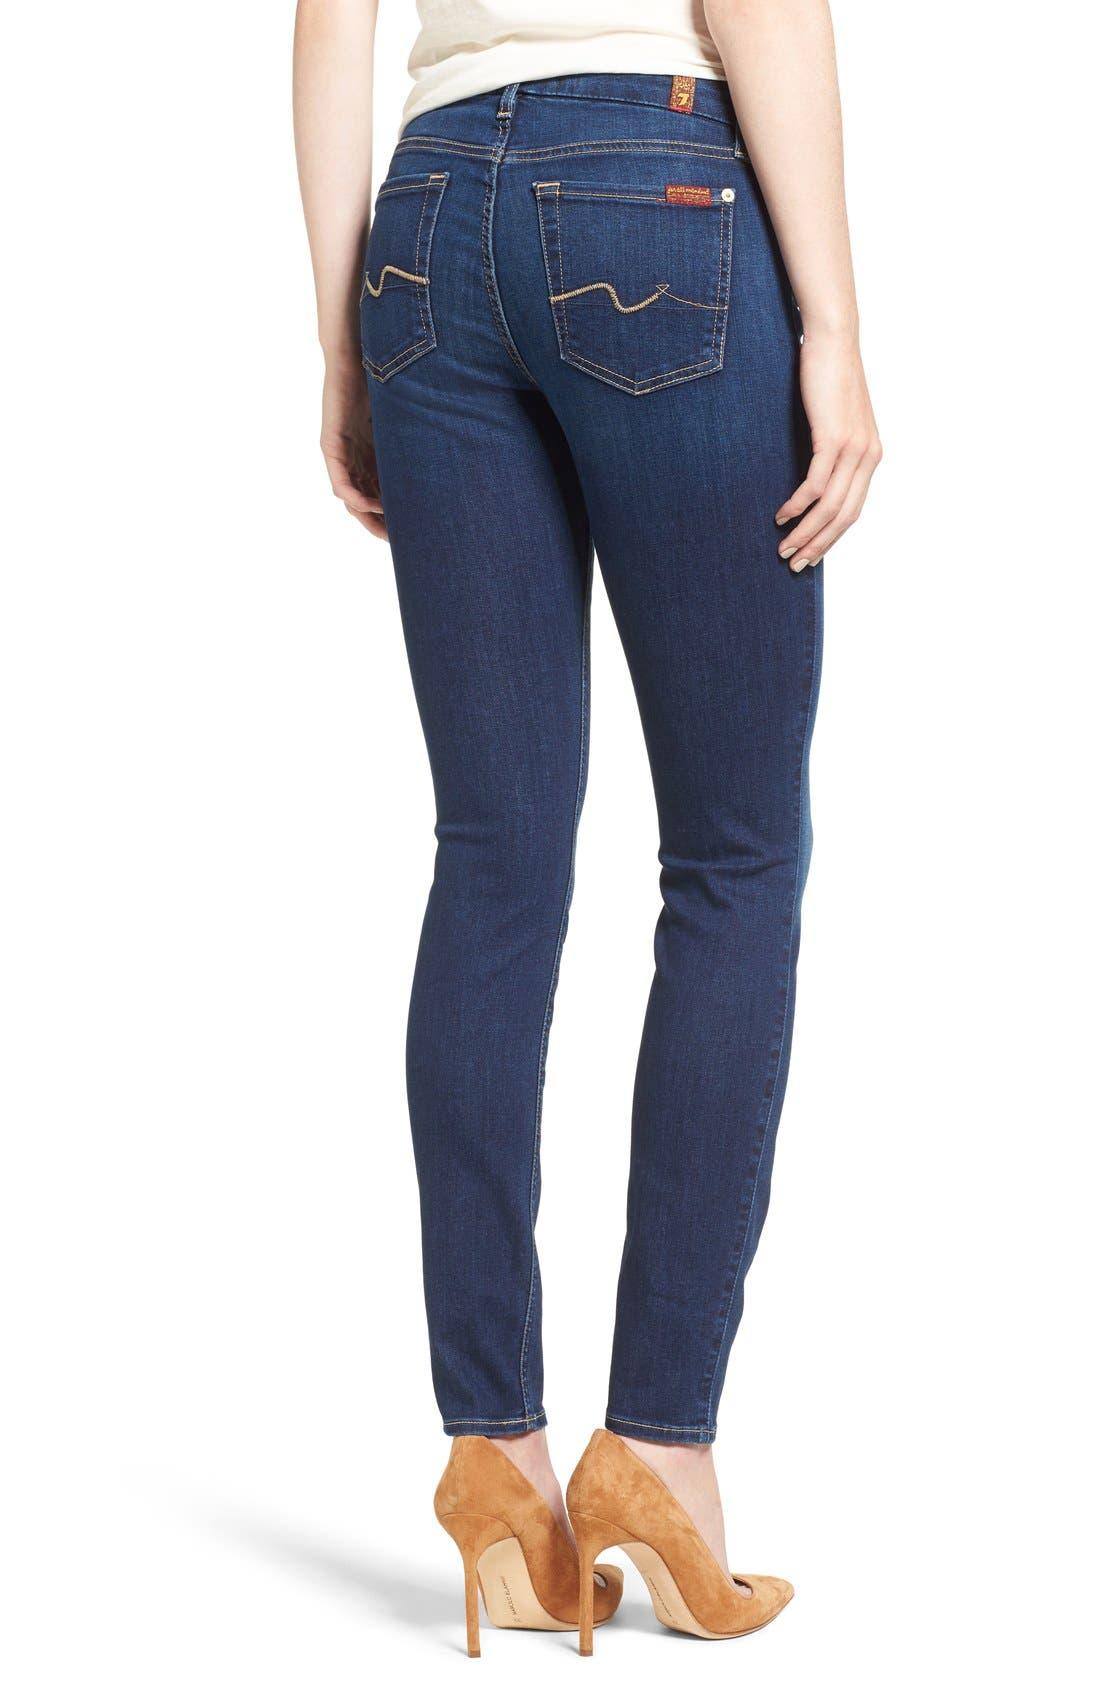 b(air) Skinny Jeans,                             Alternate thumbnail 4, color,                             400